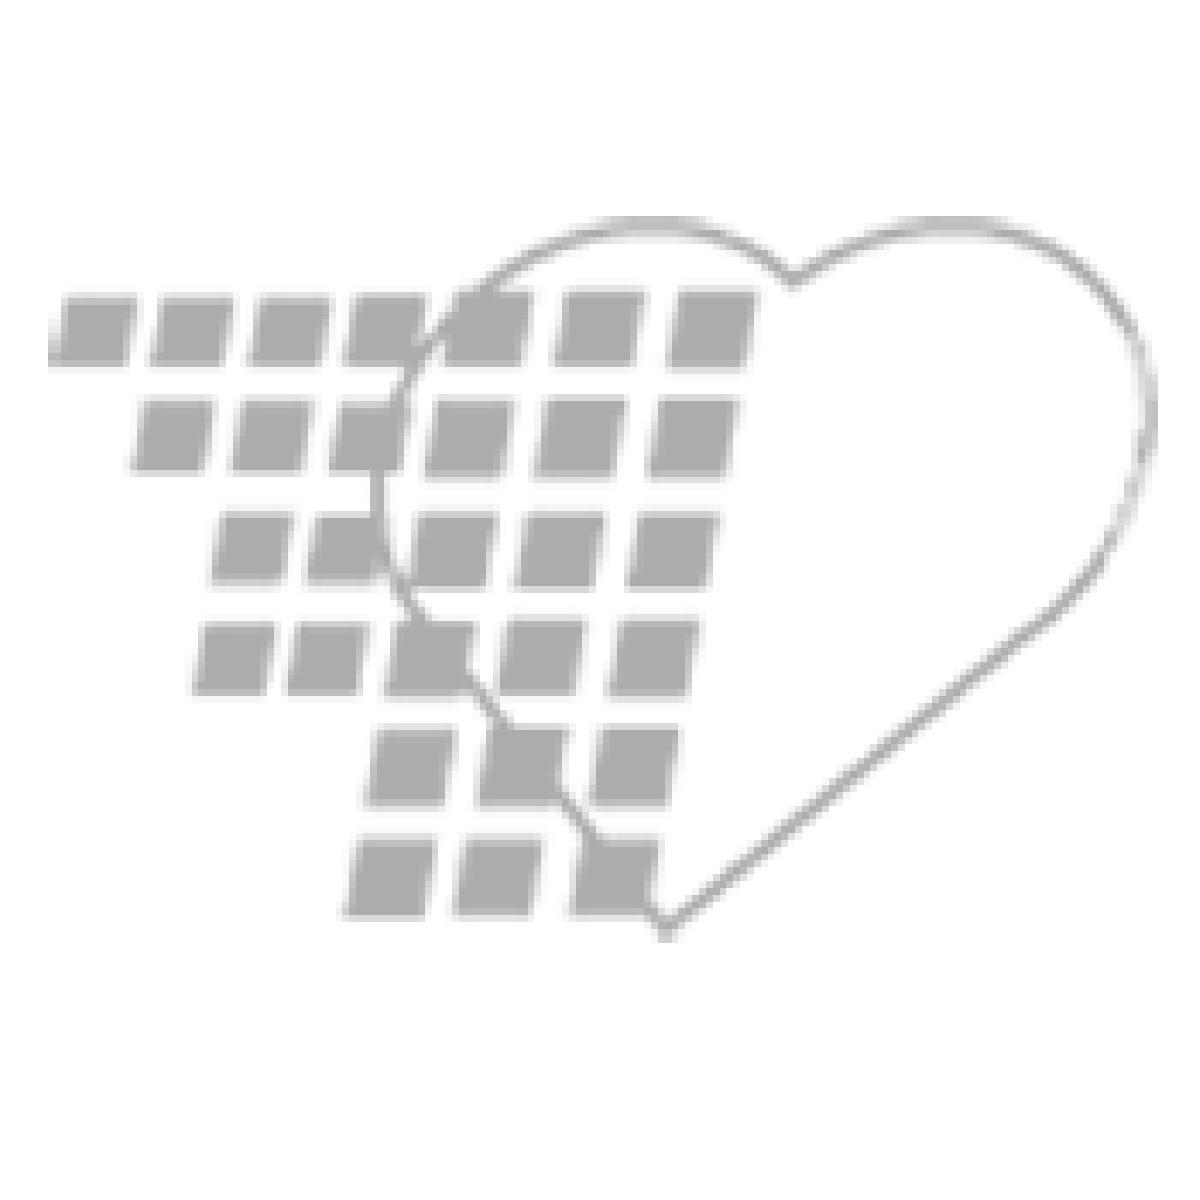 06-93-0045 - Demo Dose® Zestrl 2.5 mg - 100 Pills/Box